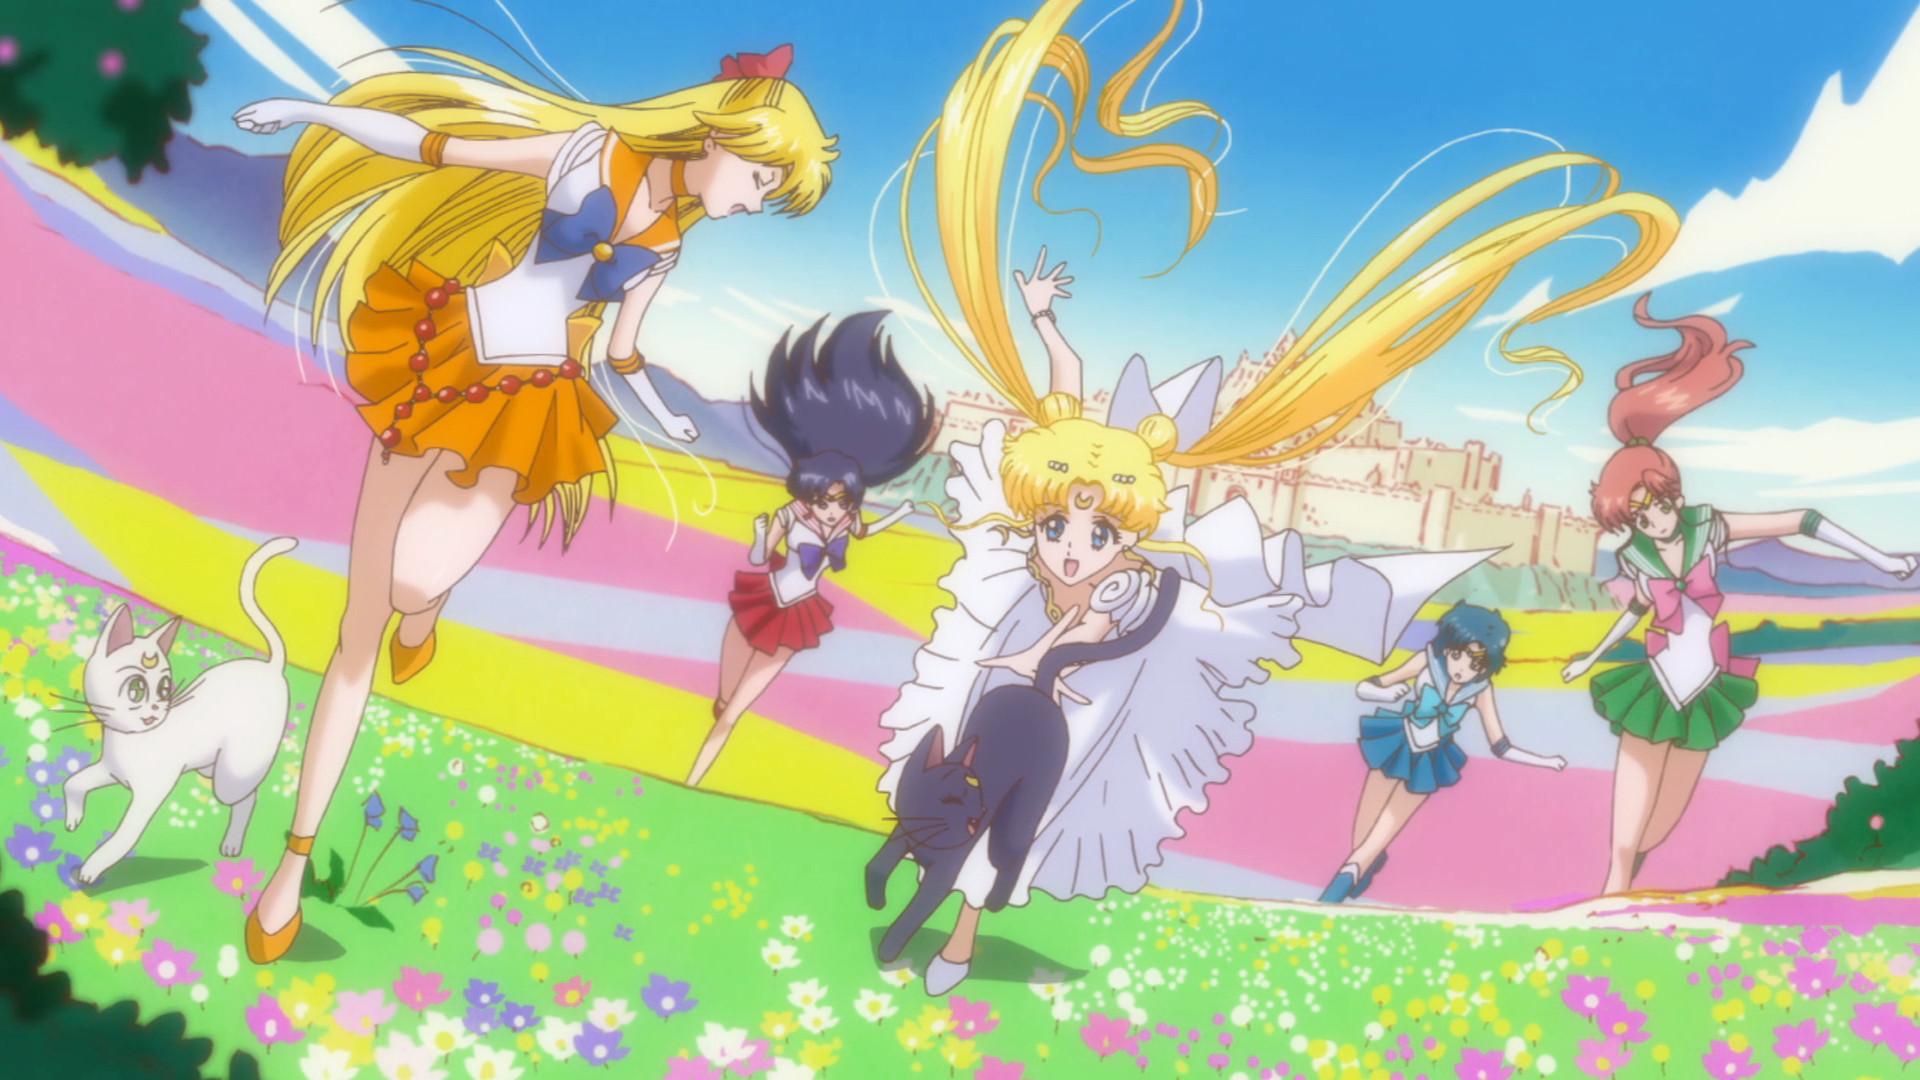 Sailor Moon Crystal Wallpaper 2 by SailorUsagiChan on DeviantArt